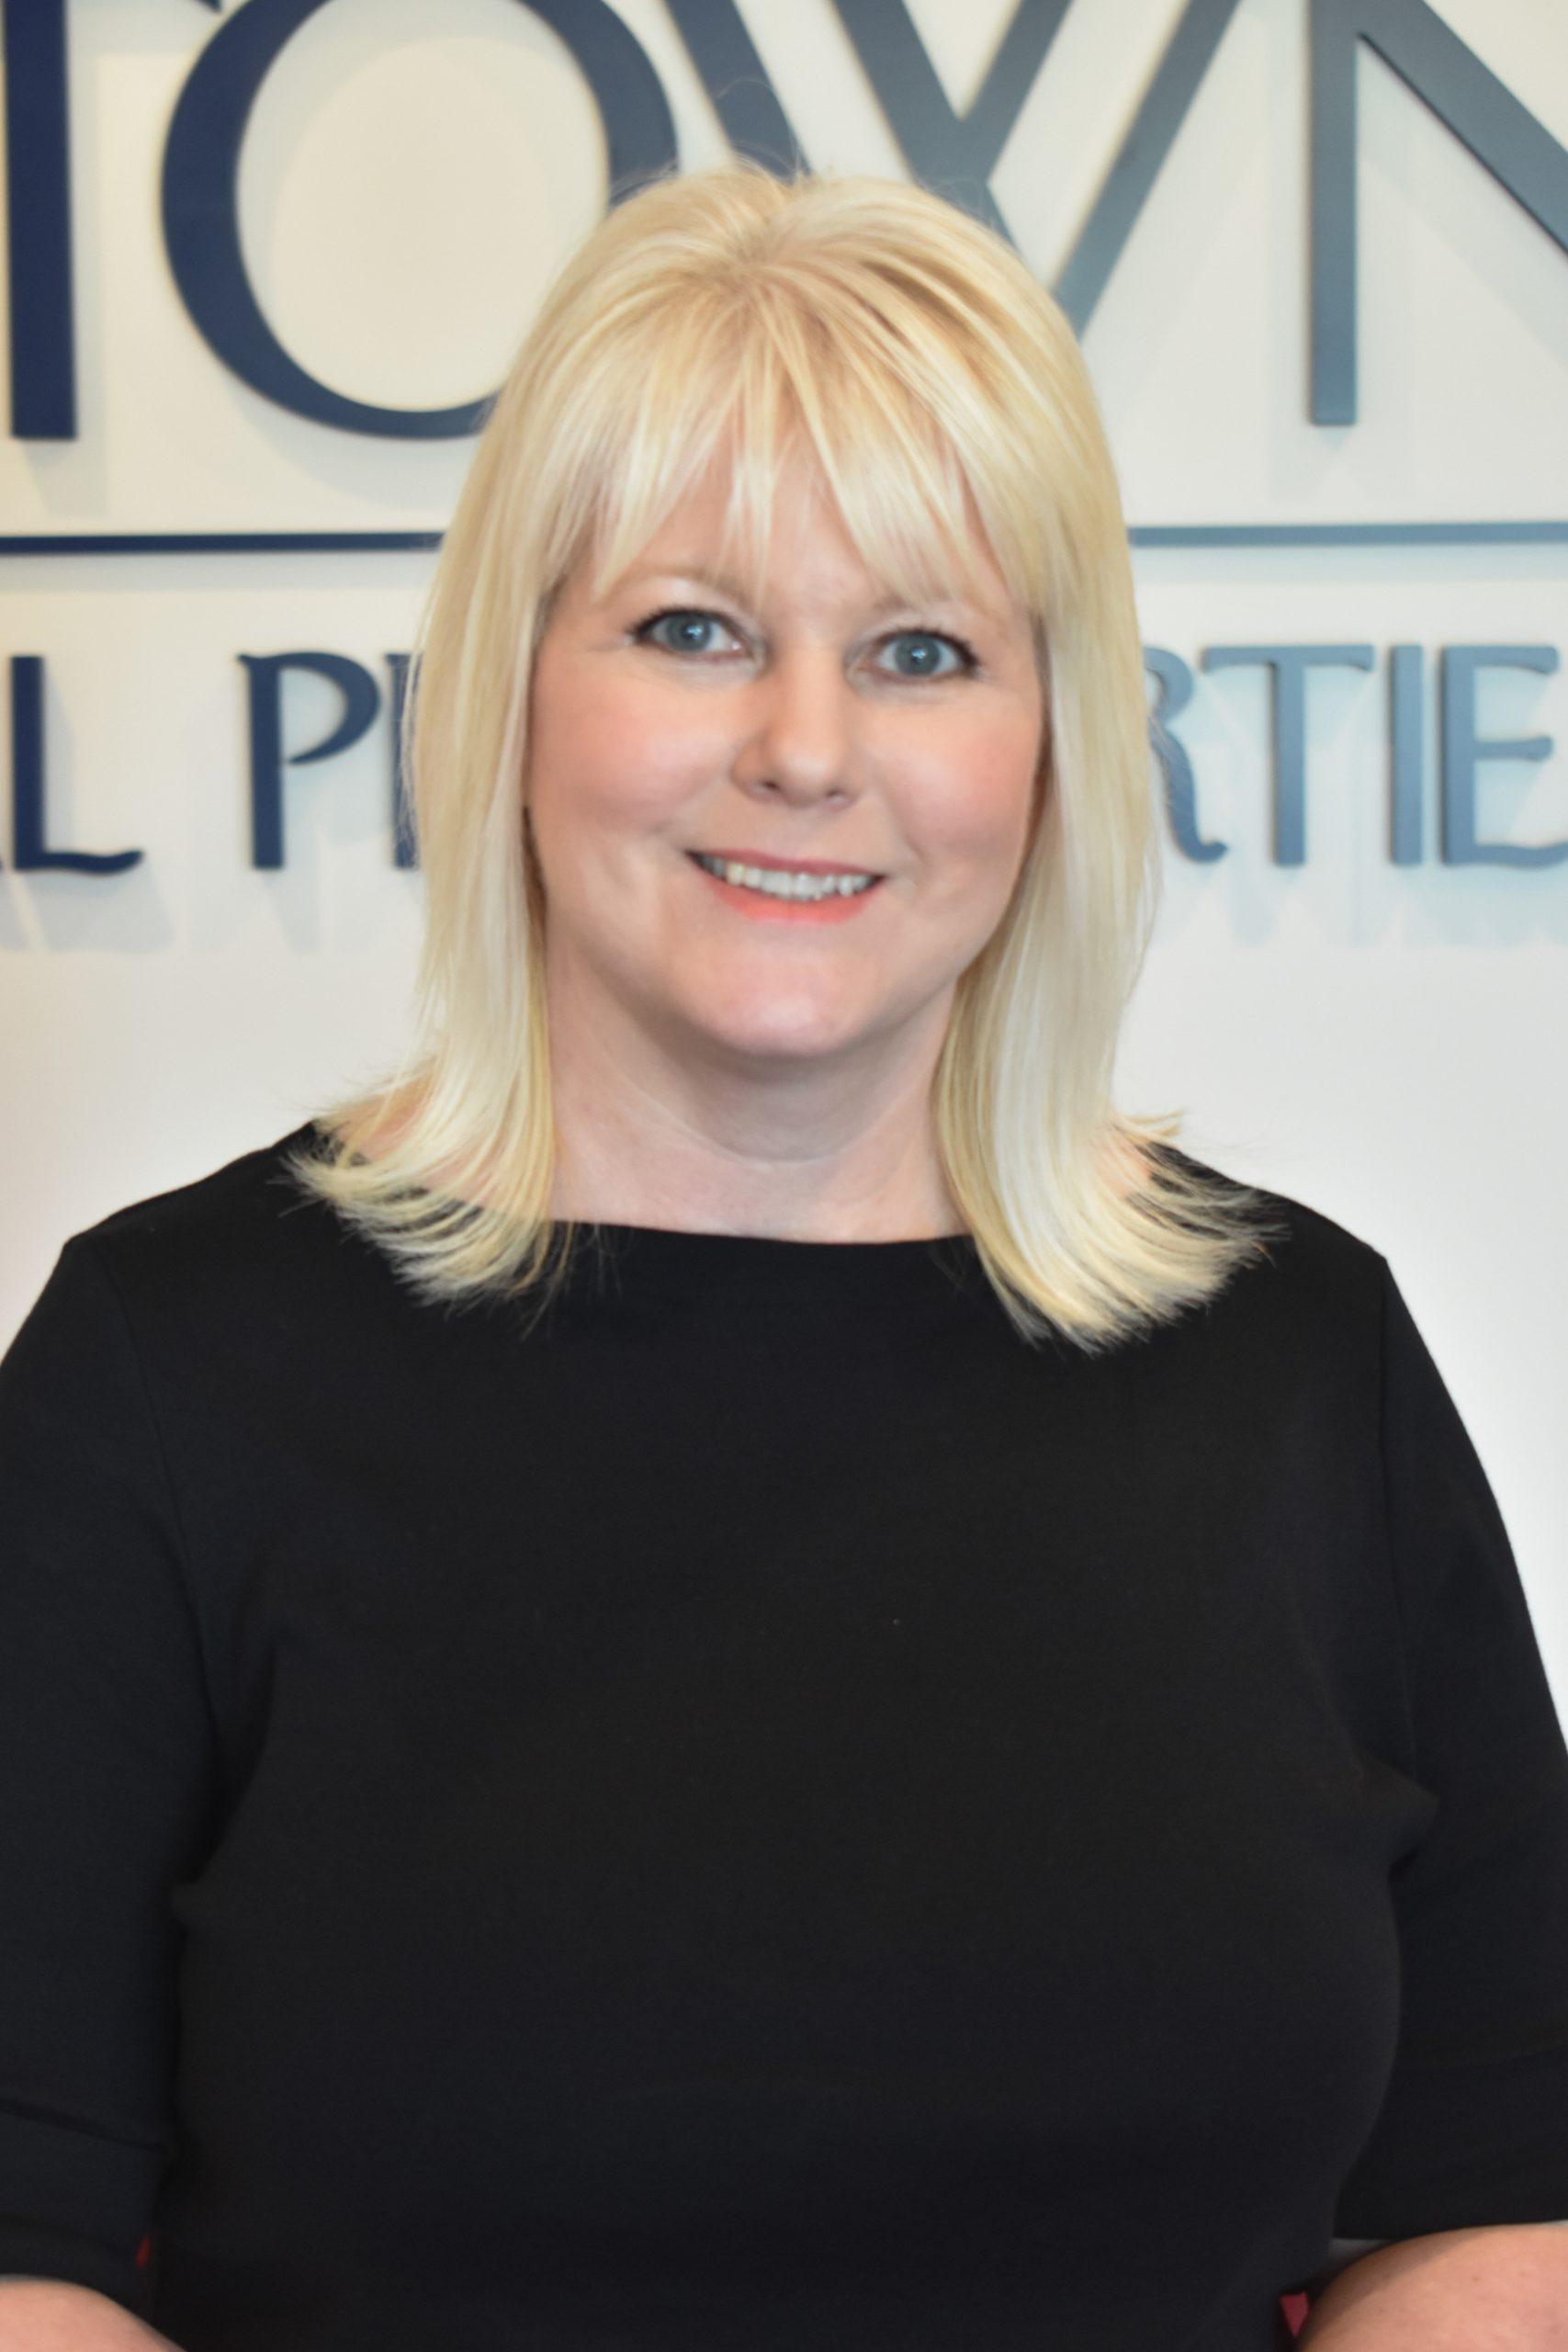 Headshot of Jennifer Roewer, Executive Assistant.